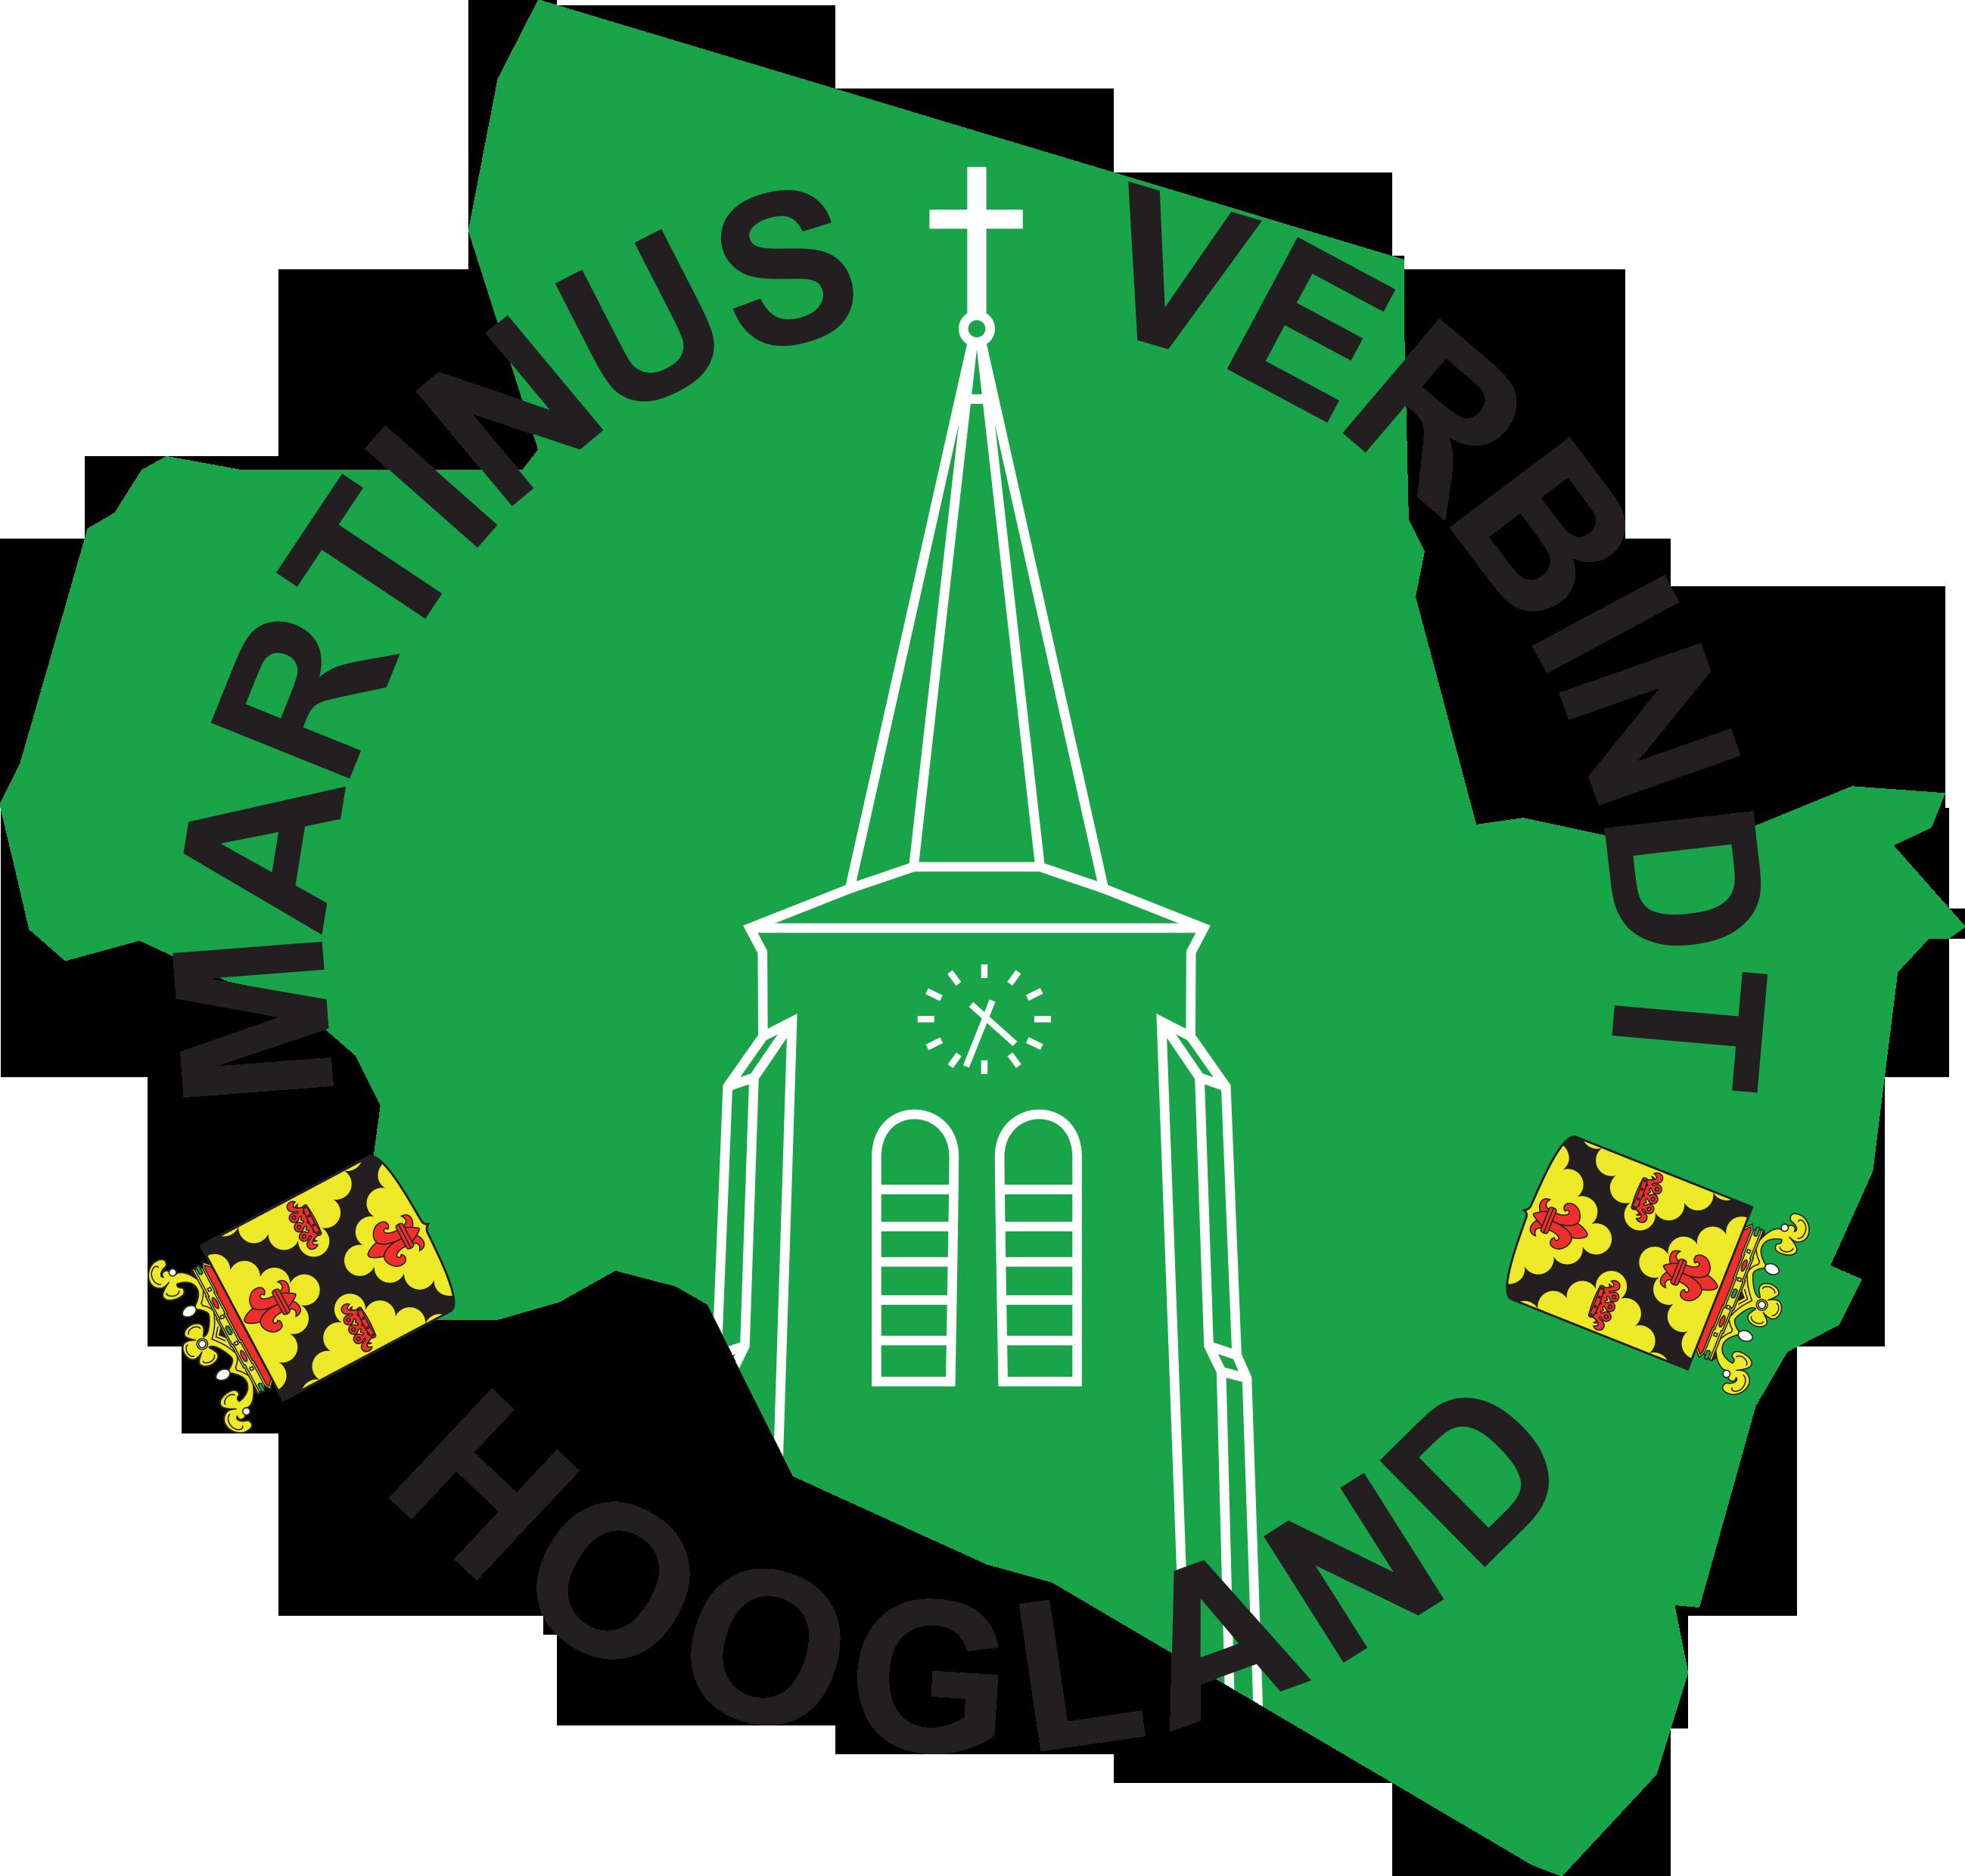 Martinus Verbindt Hoogland